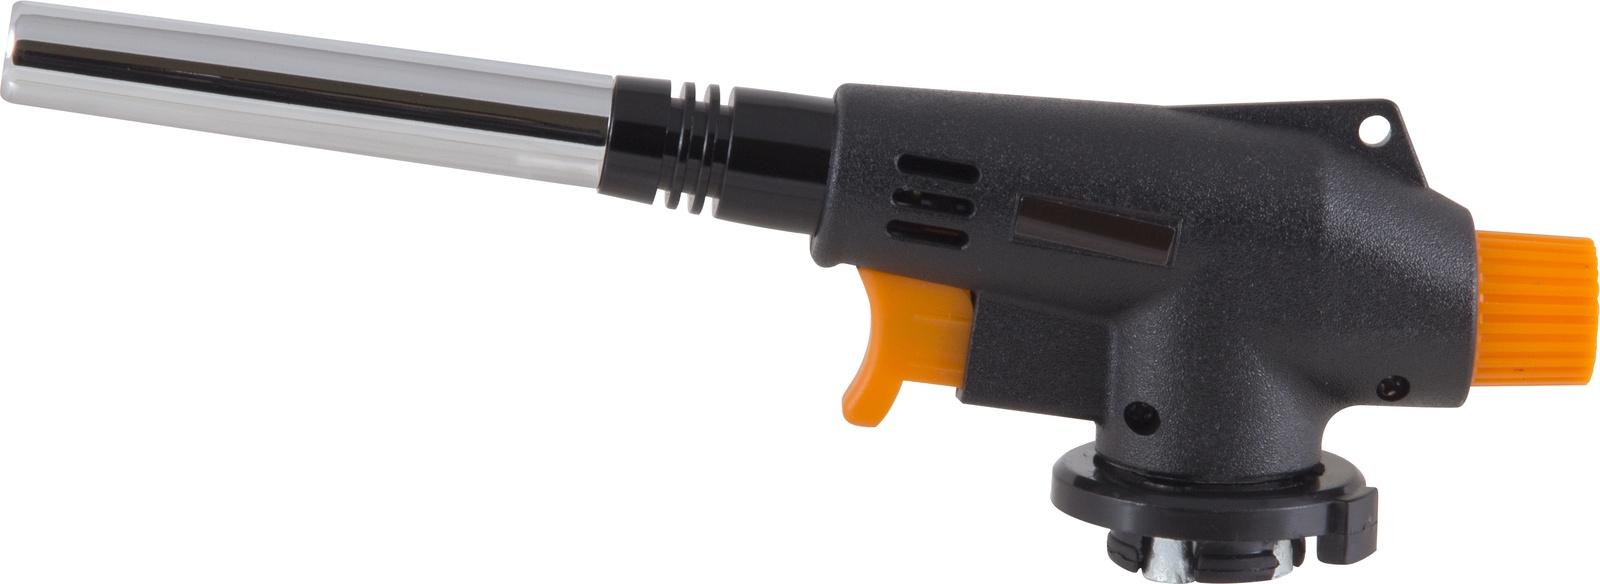 Газовая горелка ENERGY GT-04 газовая горелка для резьбового баллона armero ag10 112